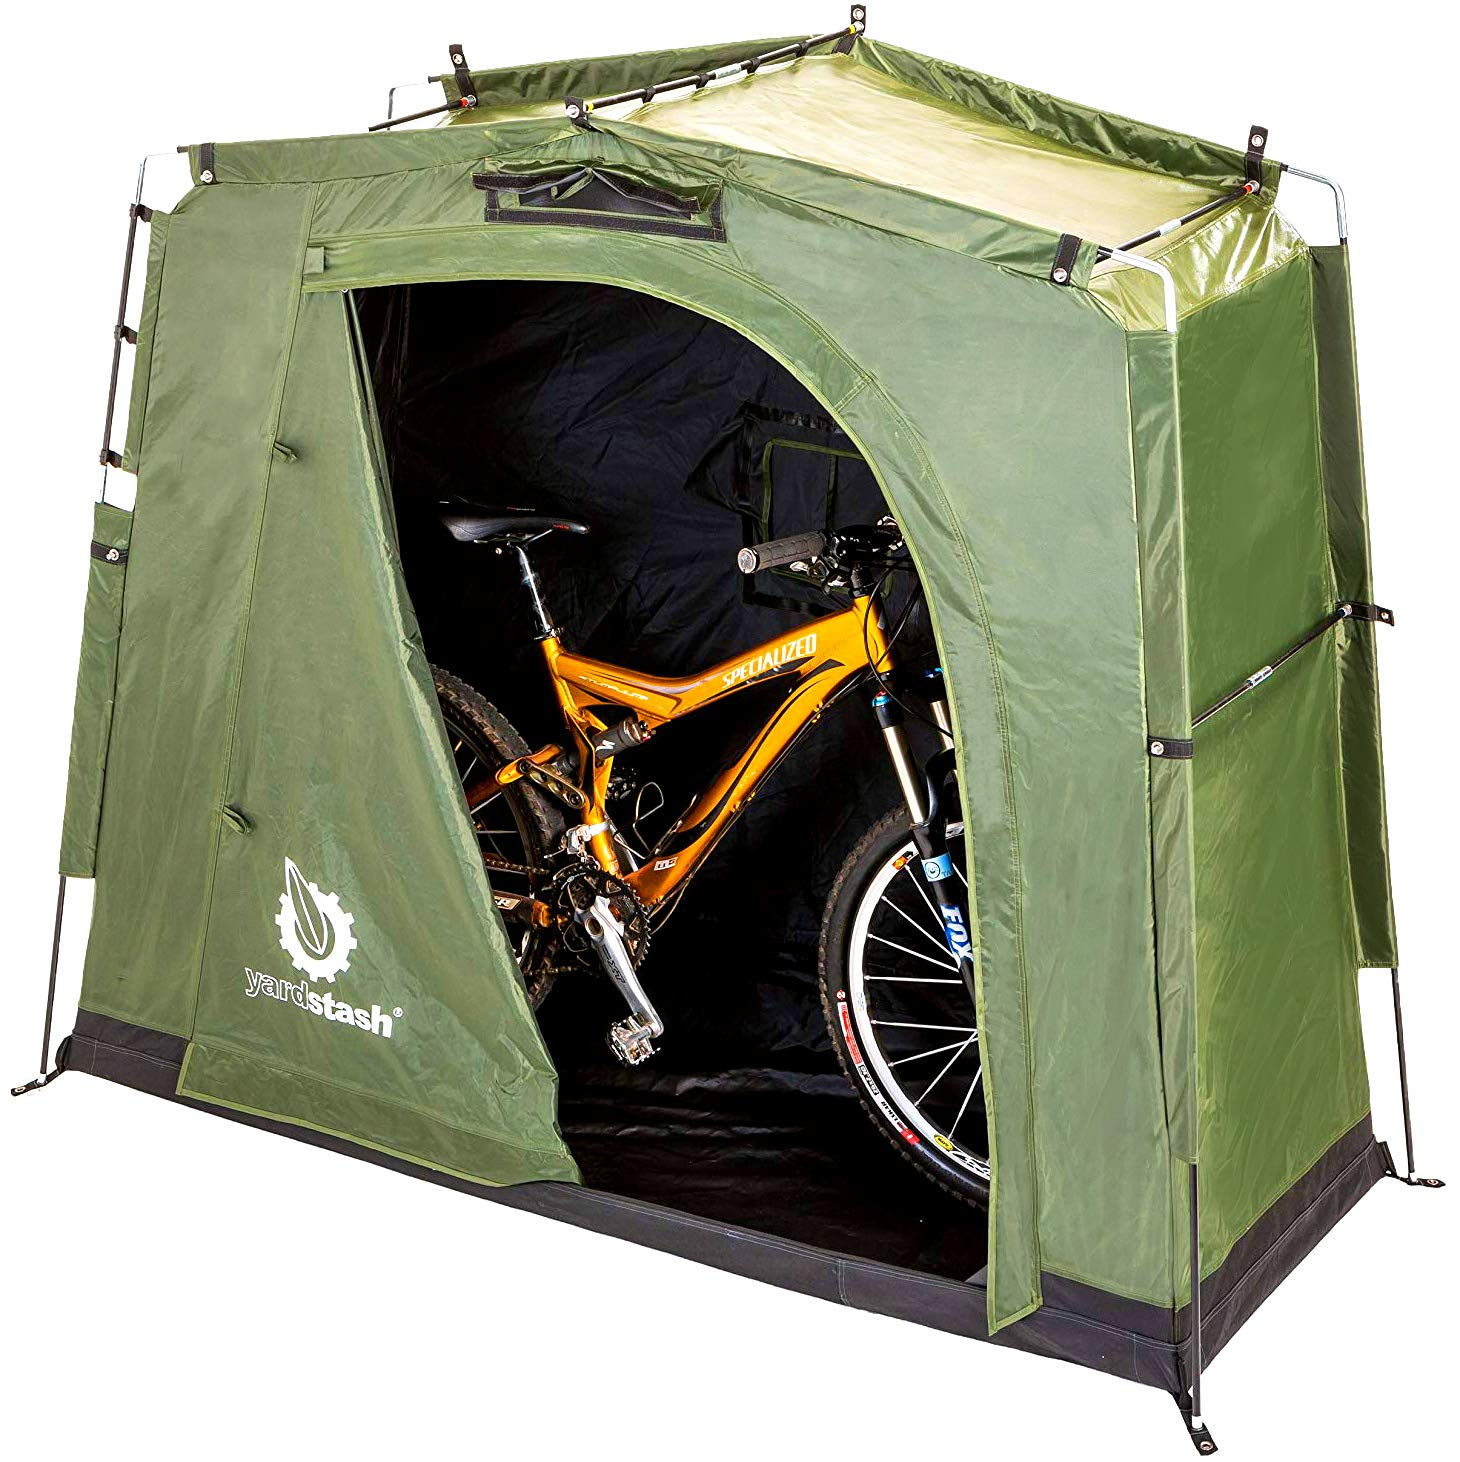 The YardStash III: Space Saving Outdoor Bike Storage, Garden Storage and Pool Storage by YardStash